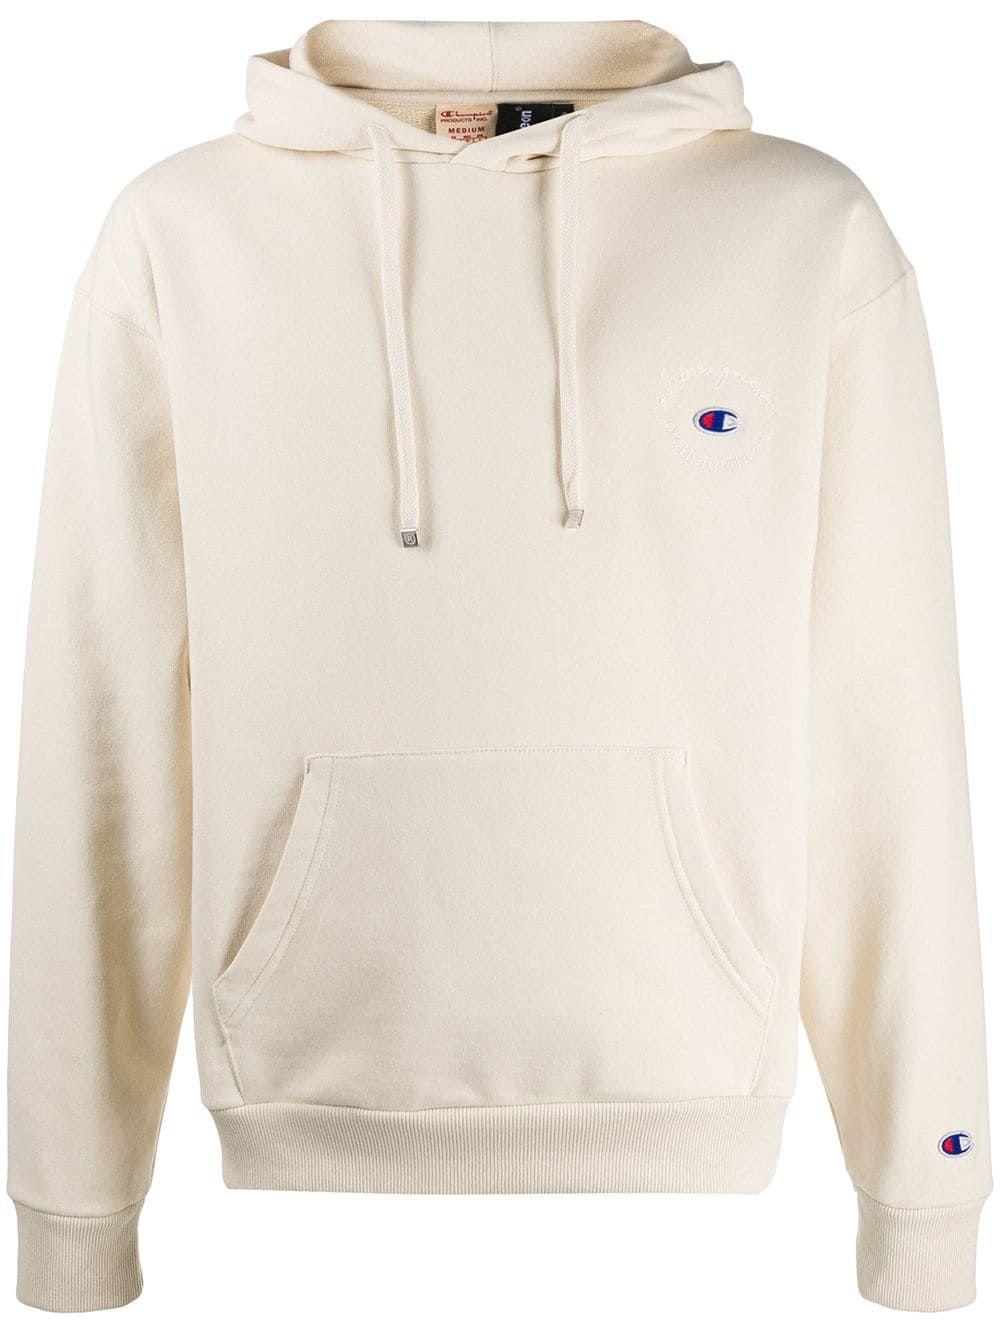 Predownload: Champion X Clothsurgeon Logo Hoodie Farfetch Hoodies Sport Outfit Men Mens Casual Outfits [ 1334 x 1000 Pixel ]